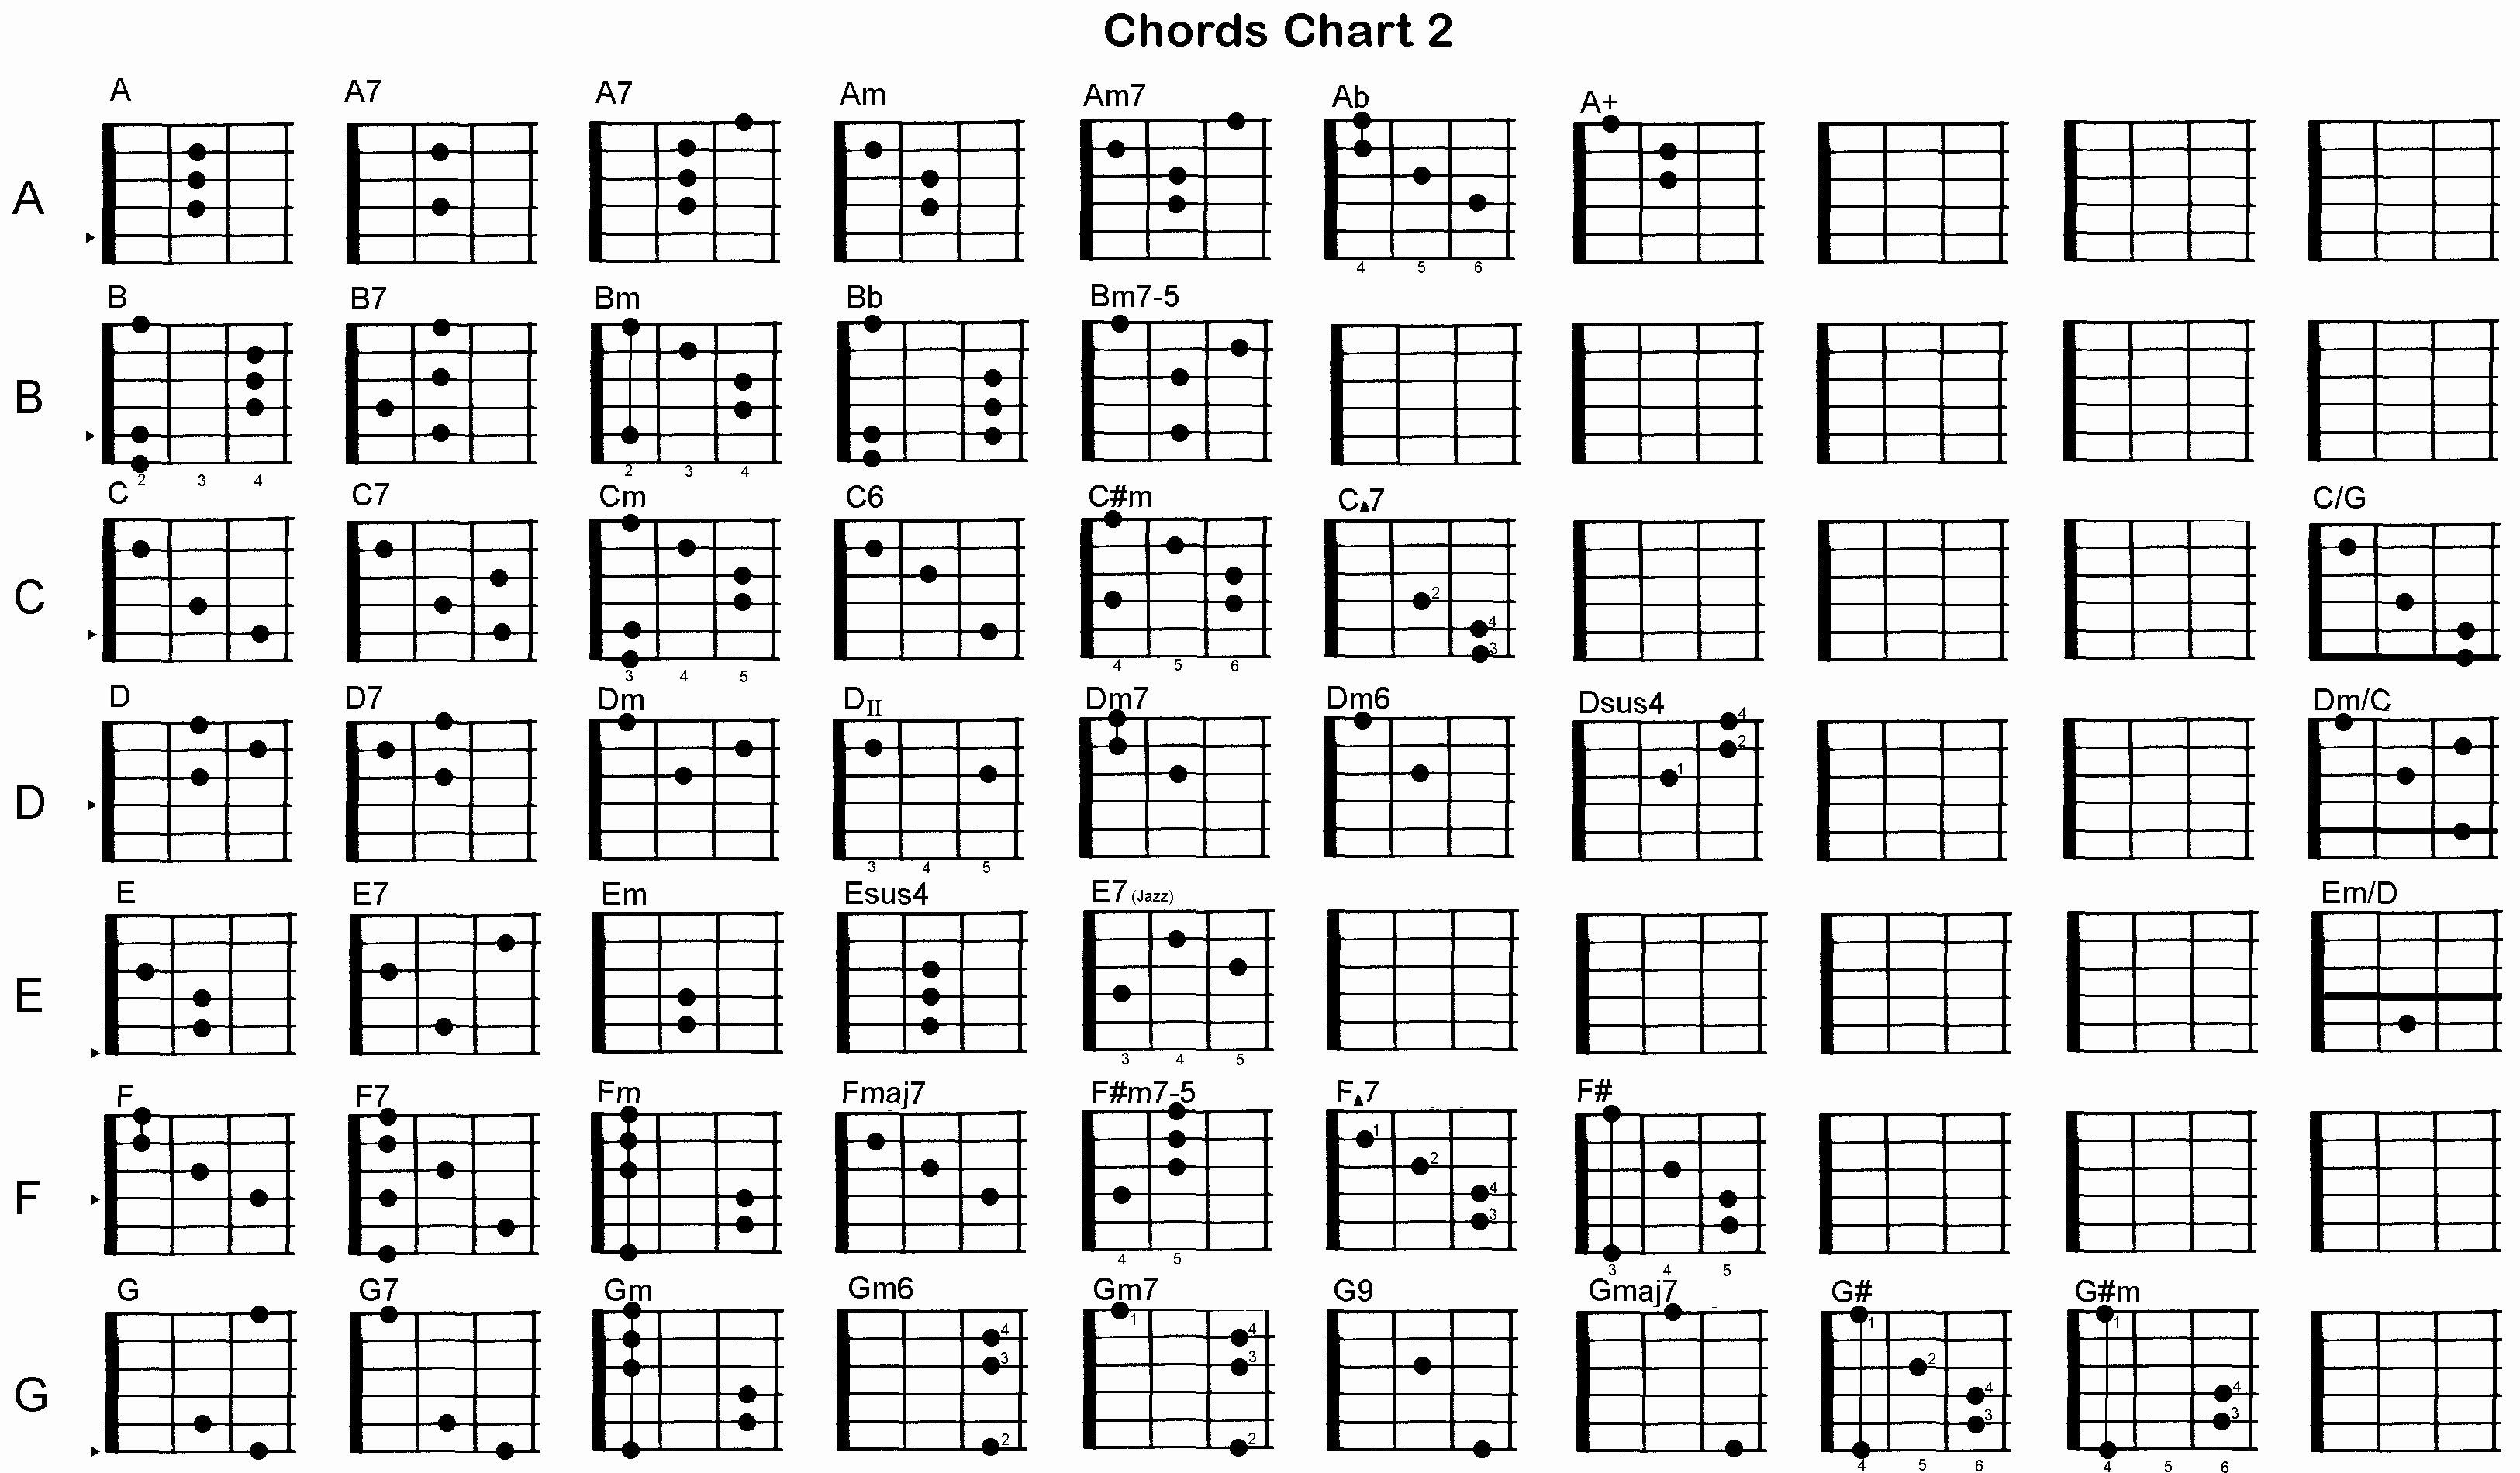 Printable Guitar Chord Chart | Accomplice Music - Free Printable Bass Guitar Chord Chart